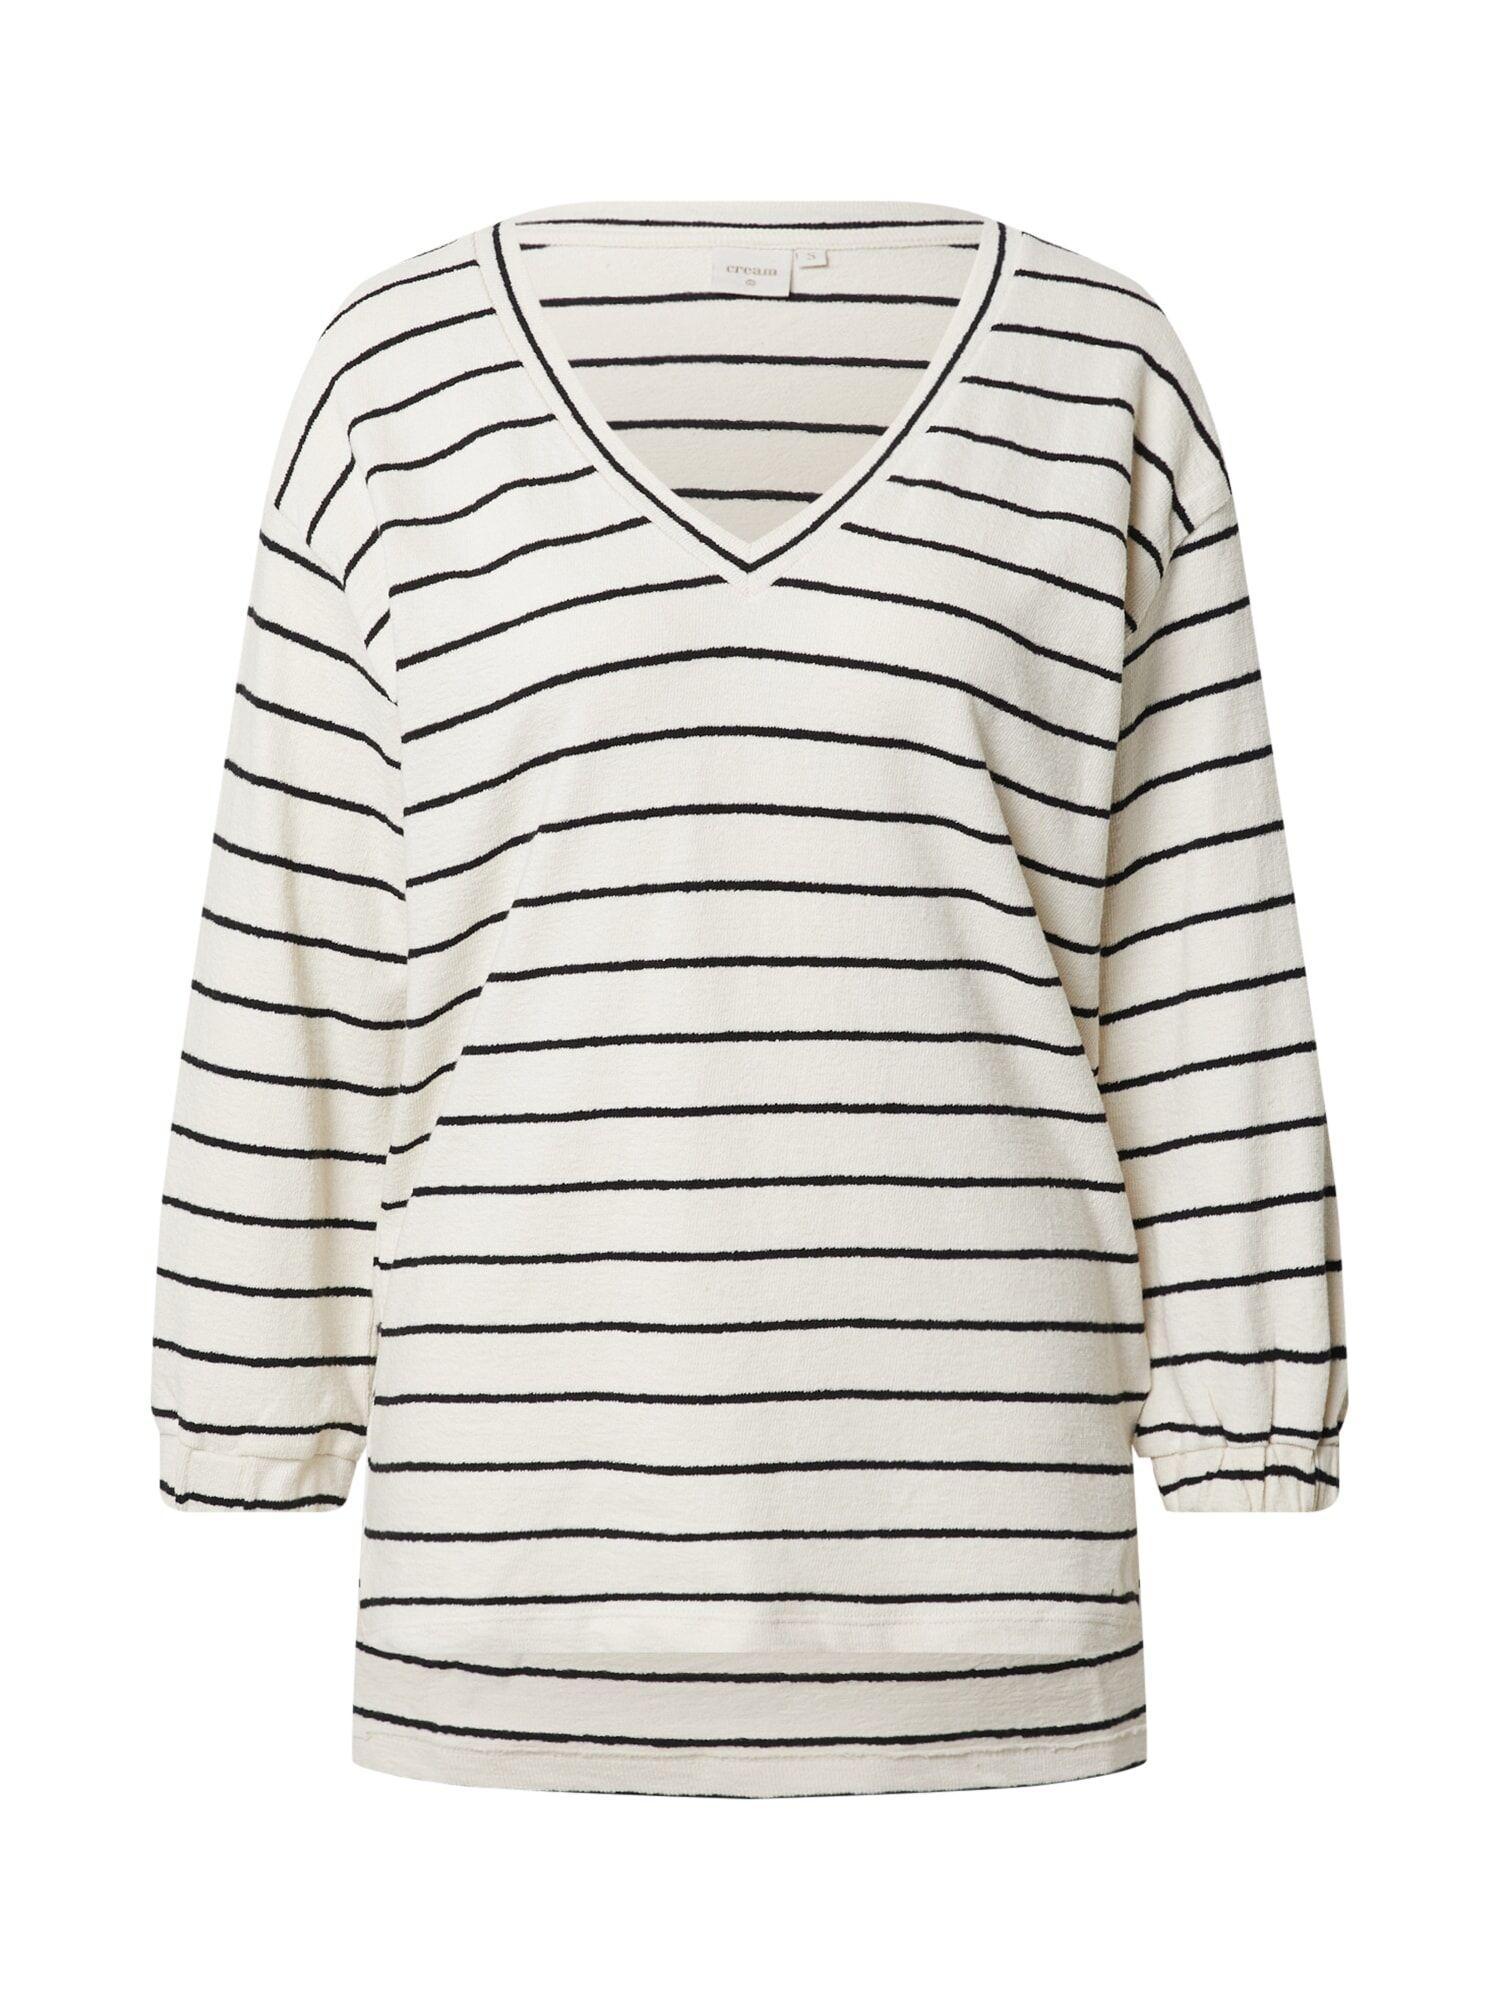 Cream T-shirt 'Krystala'  - Blanc - Taille: S - female